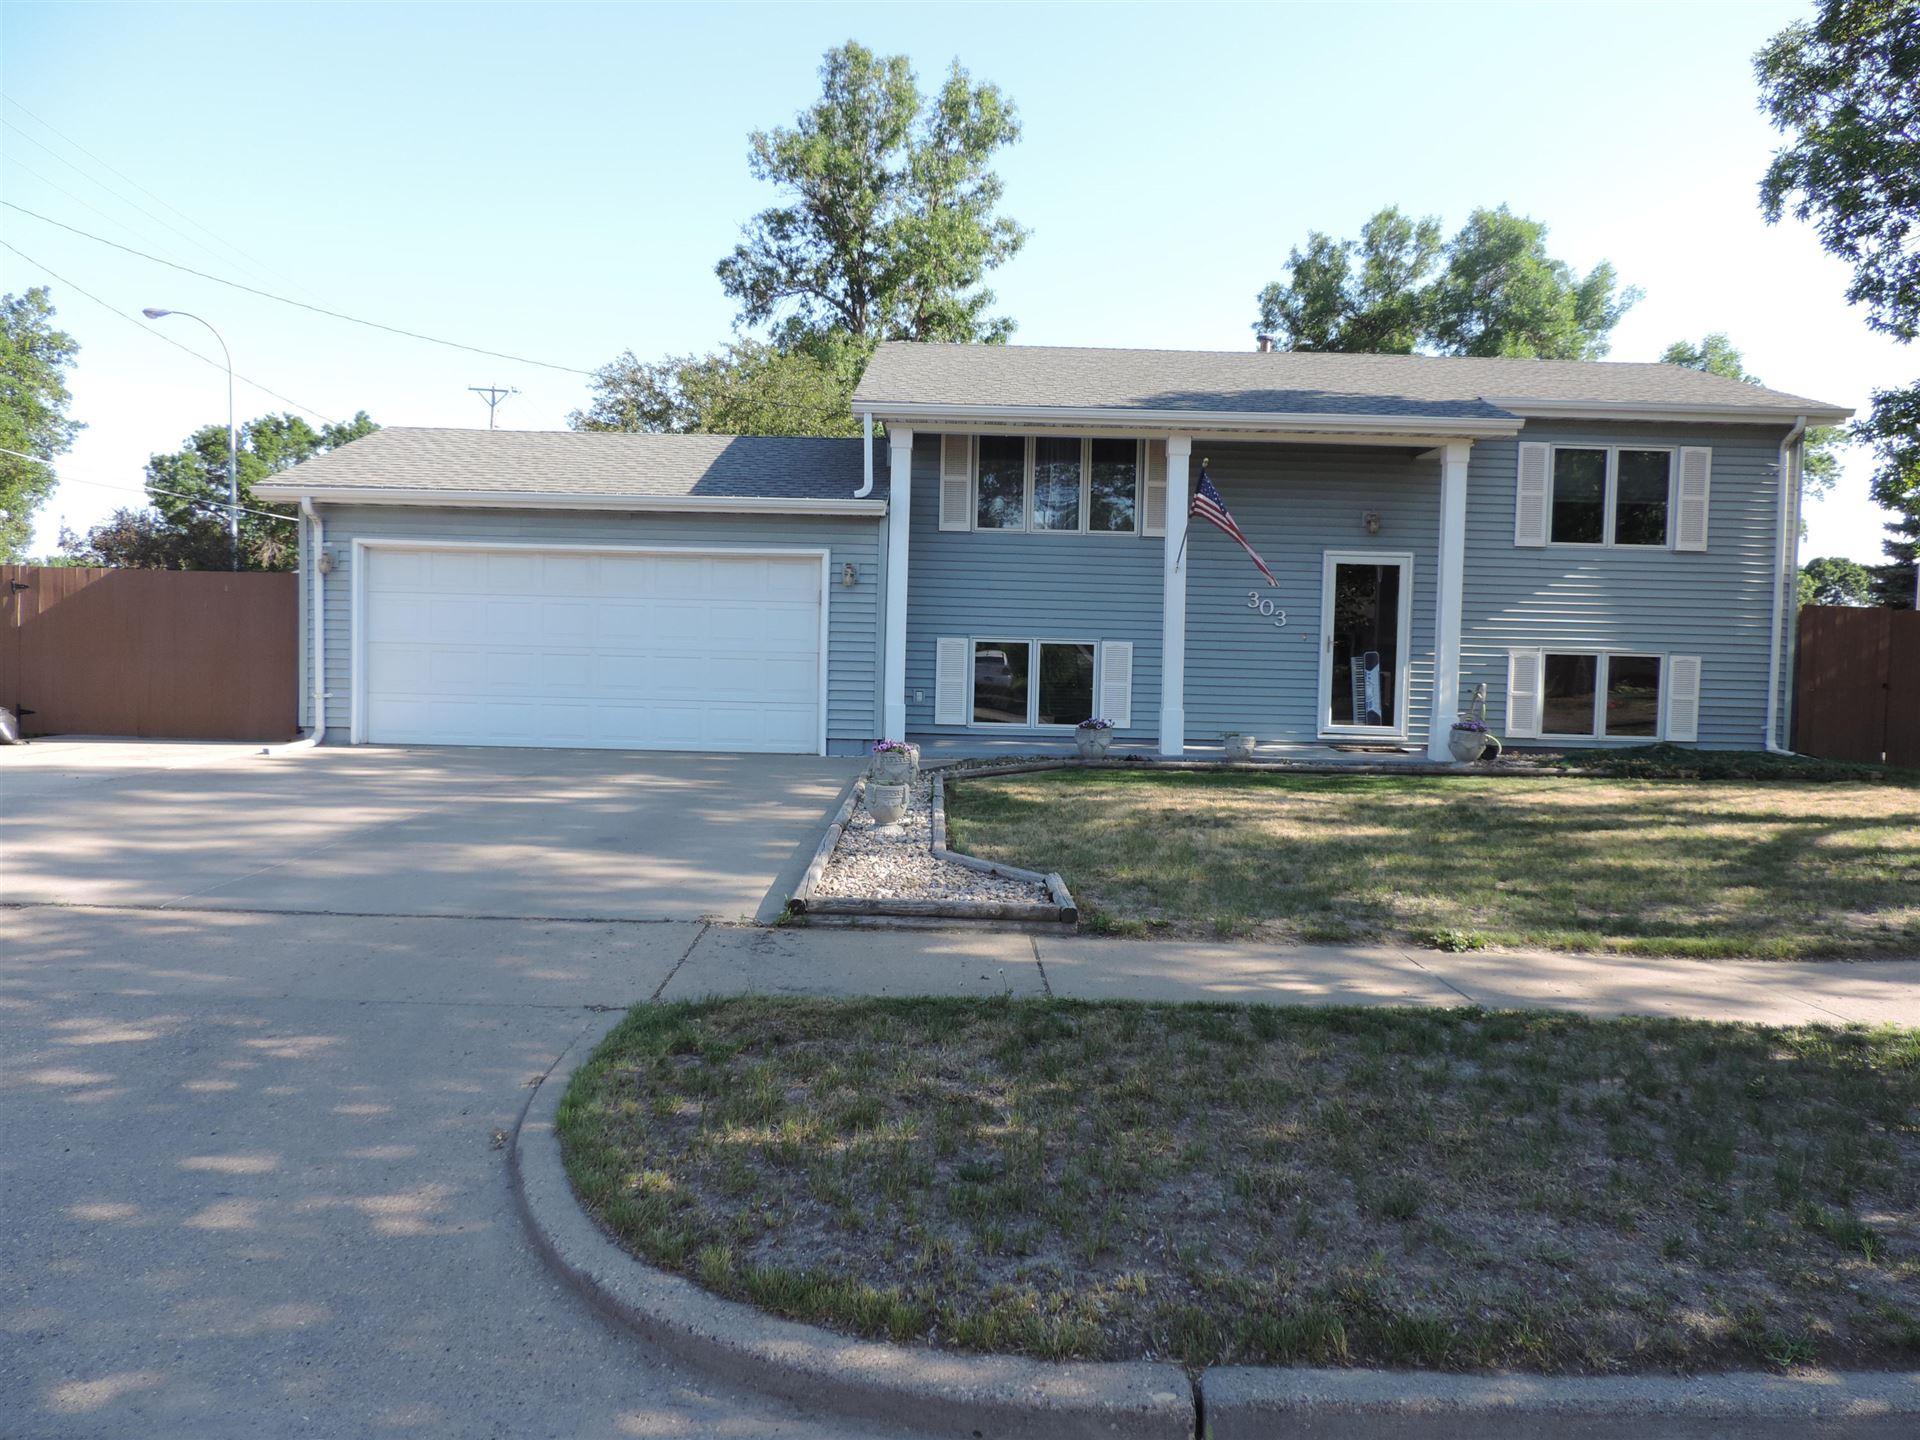 303 Easy Street, Bismarck, ND 58504 - #: 411190